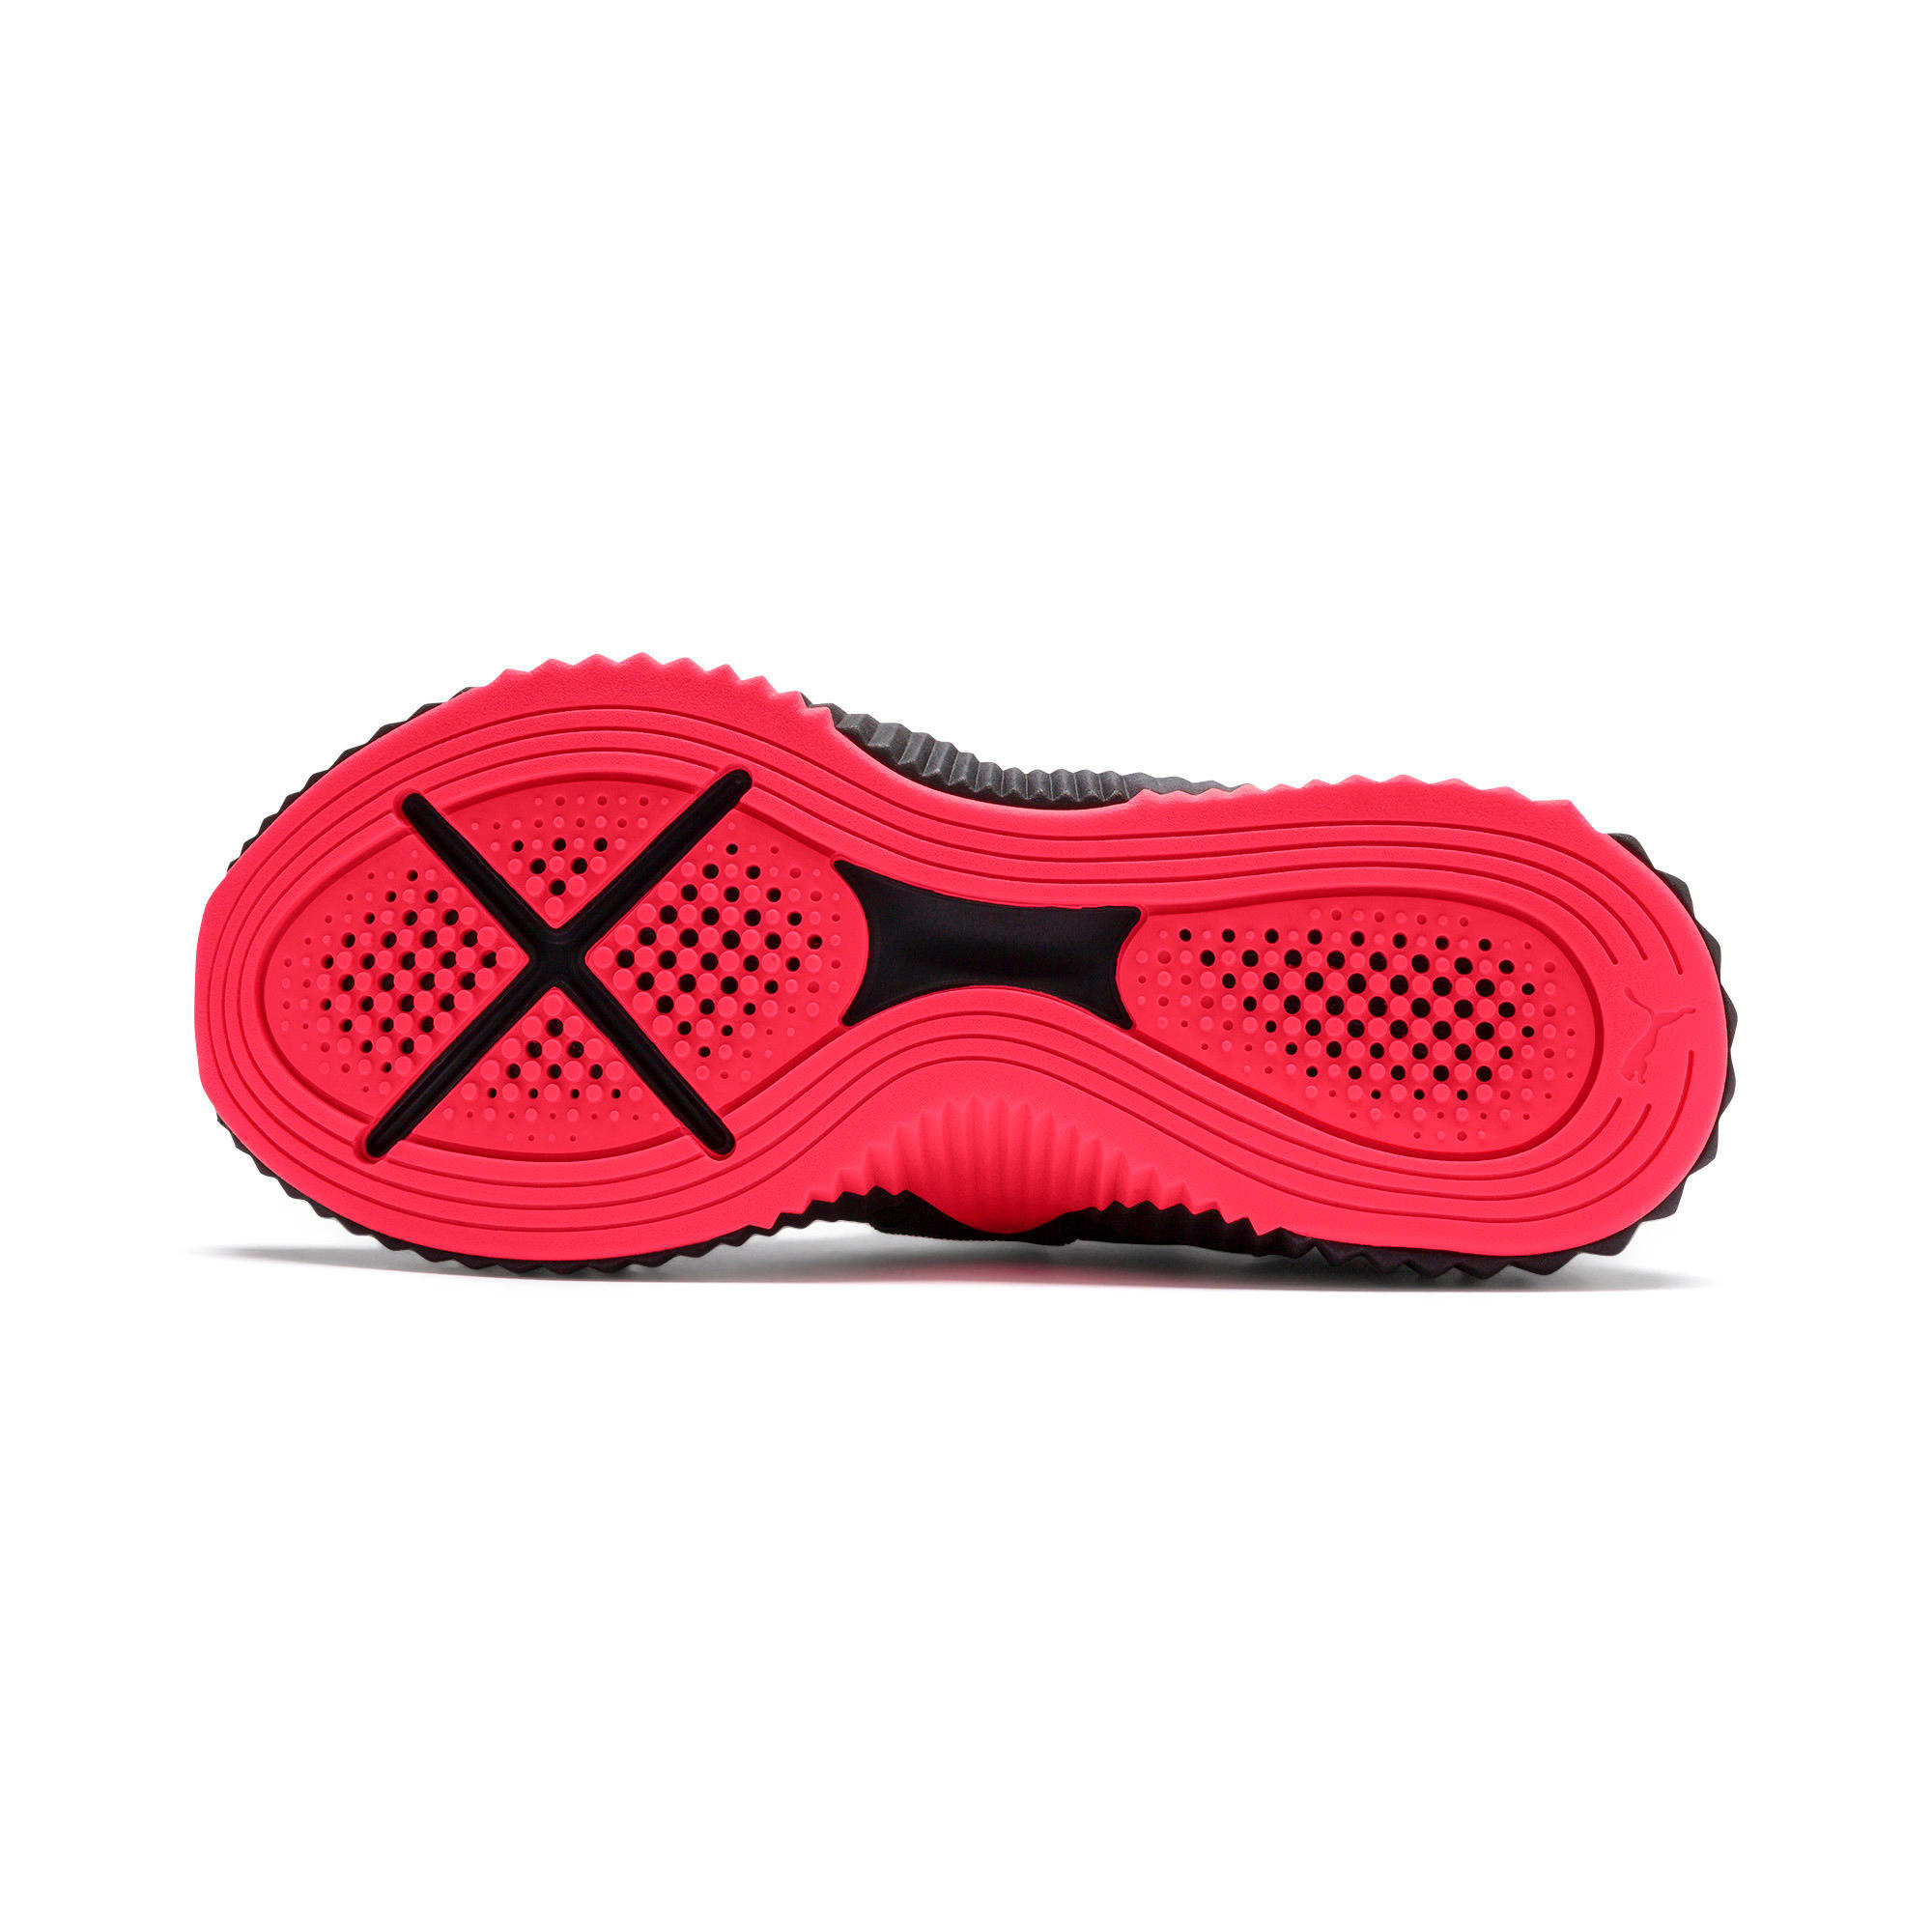 Thumbnail 5 of Defy Mid Core Women's Training Shoes, Puma Black-Pink Alert, medium